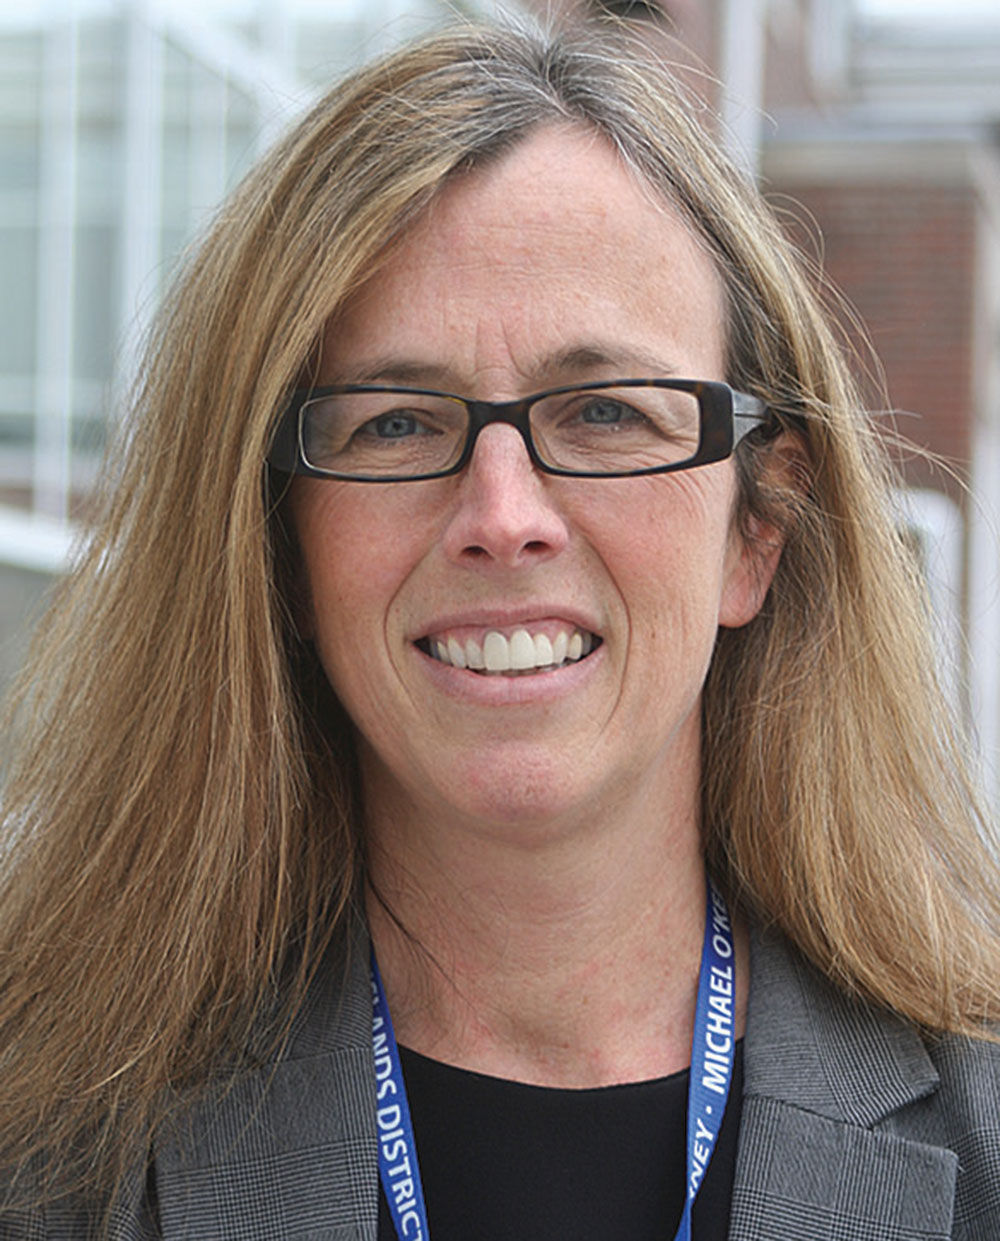 falmouth interim principal lands permanent position at lawrence falmouth interim principal lands permanent position at lawrence